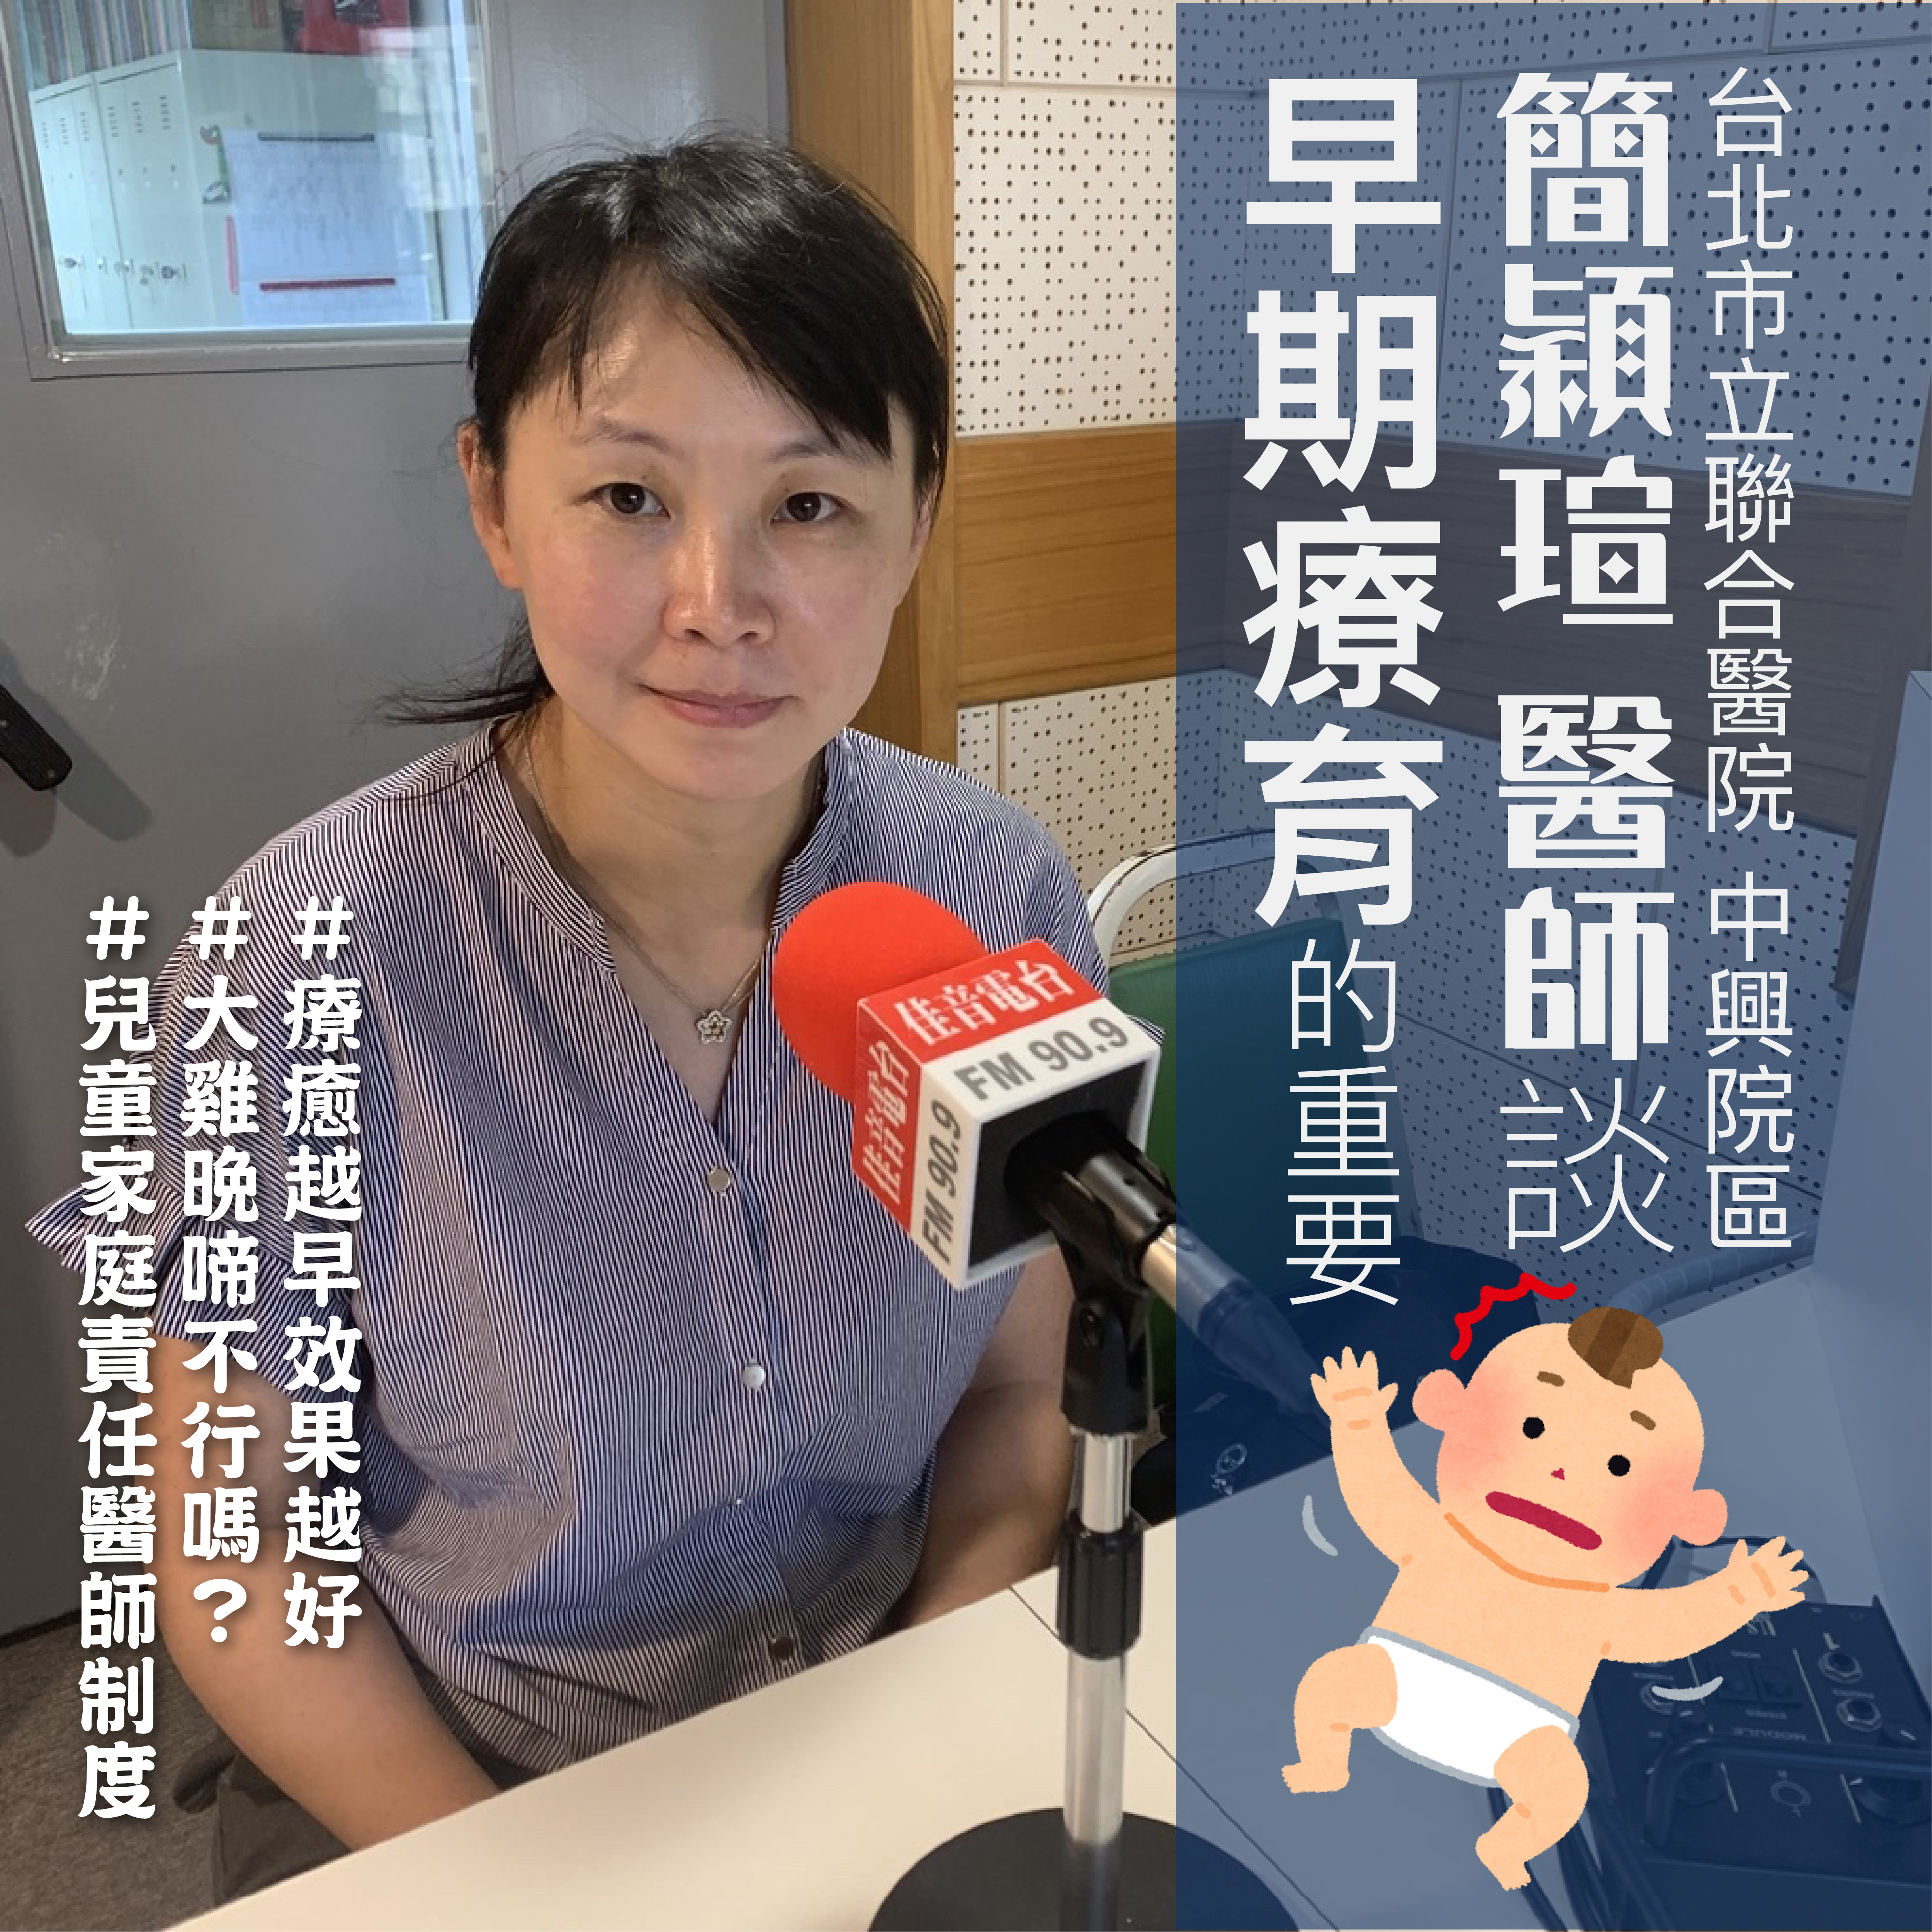 【Ep.16】大雞晚啼行不行?!feat.中興醫院-簡穎瑄醫師